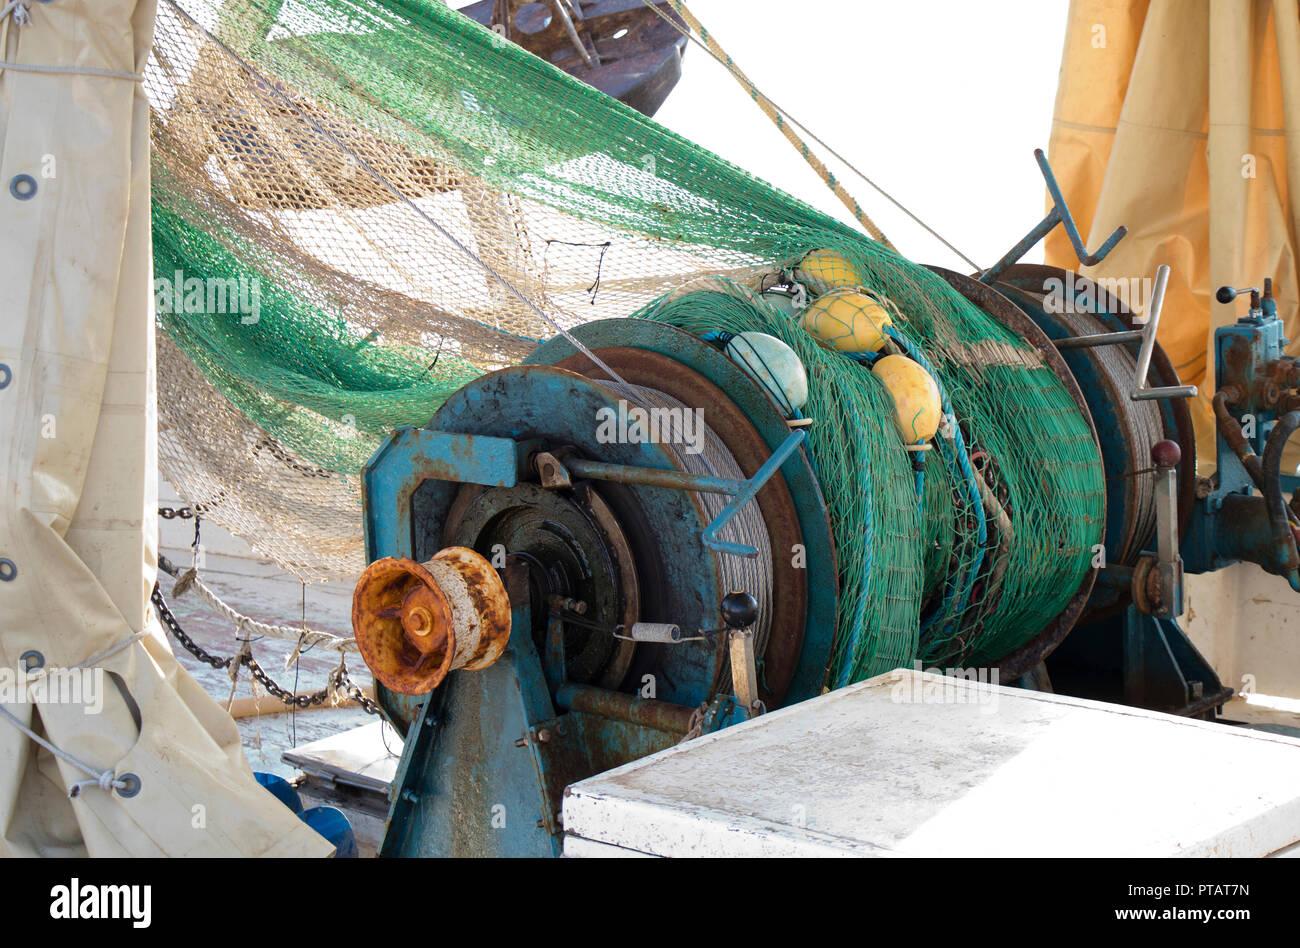 Capstan warp winch on a trawler fishing boat - Stock Image